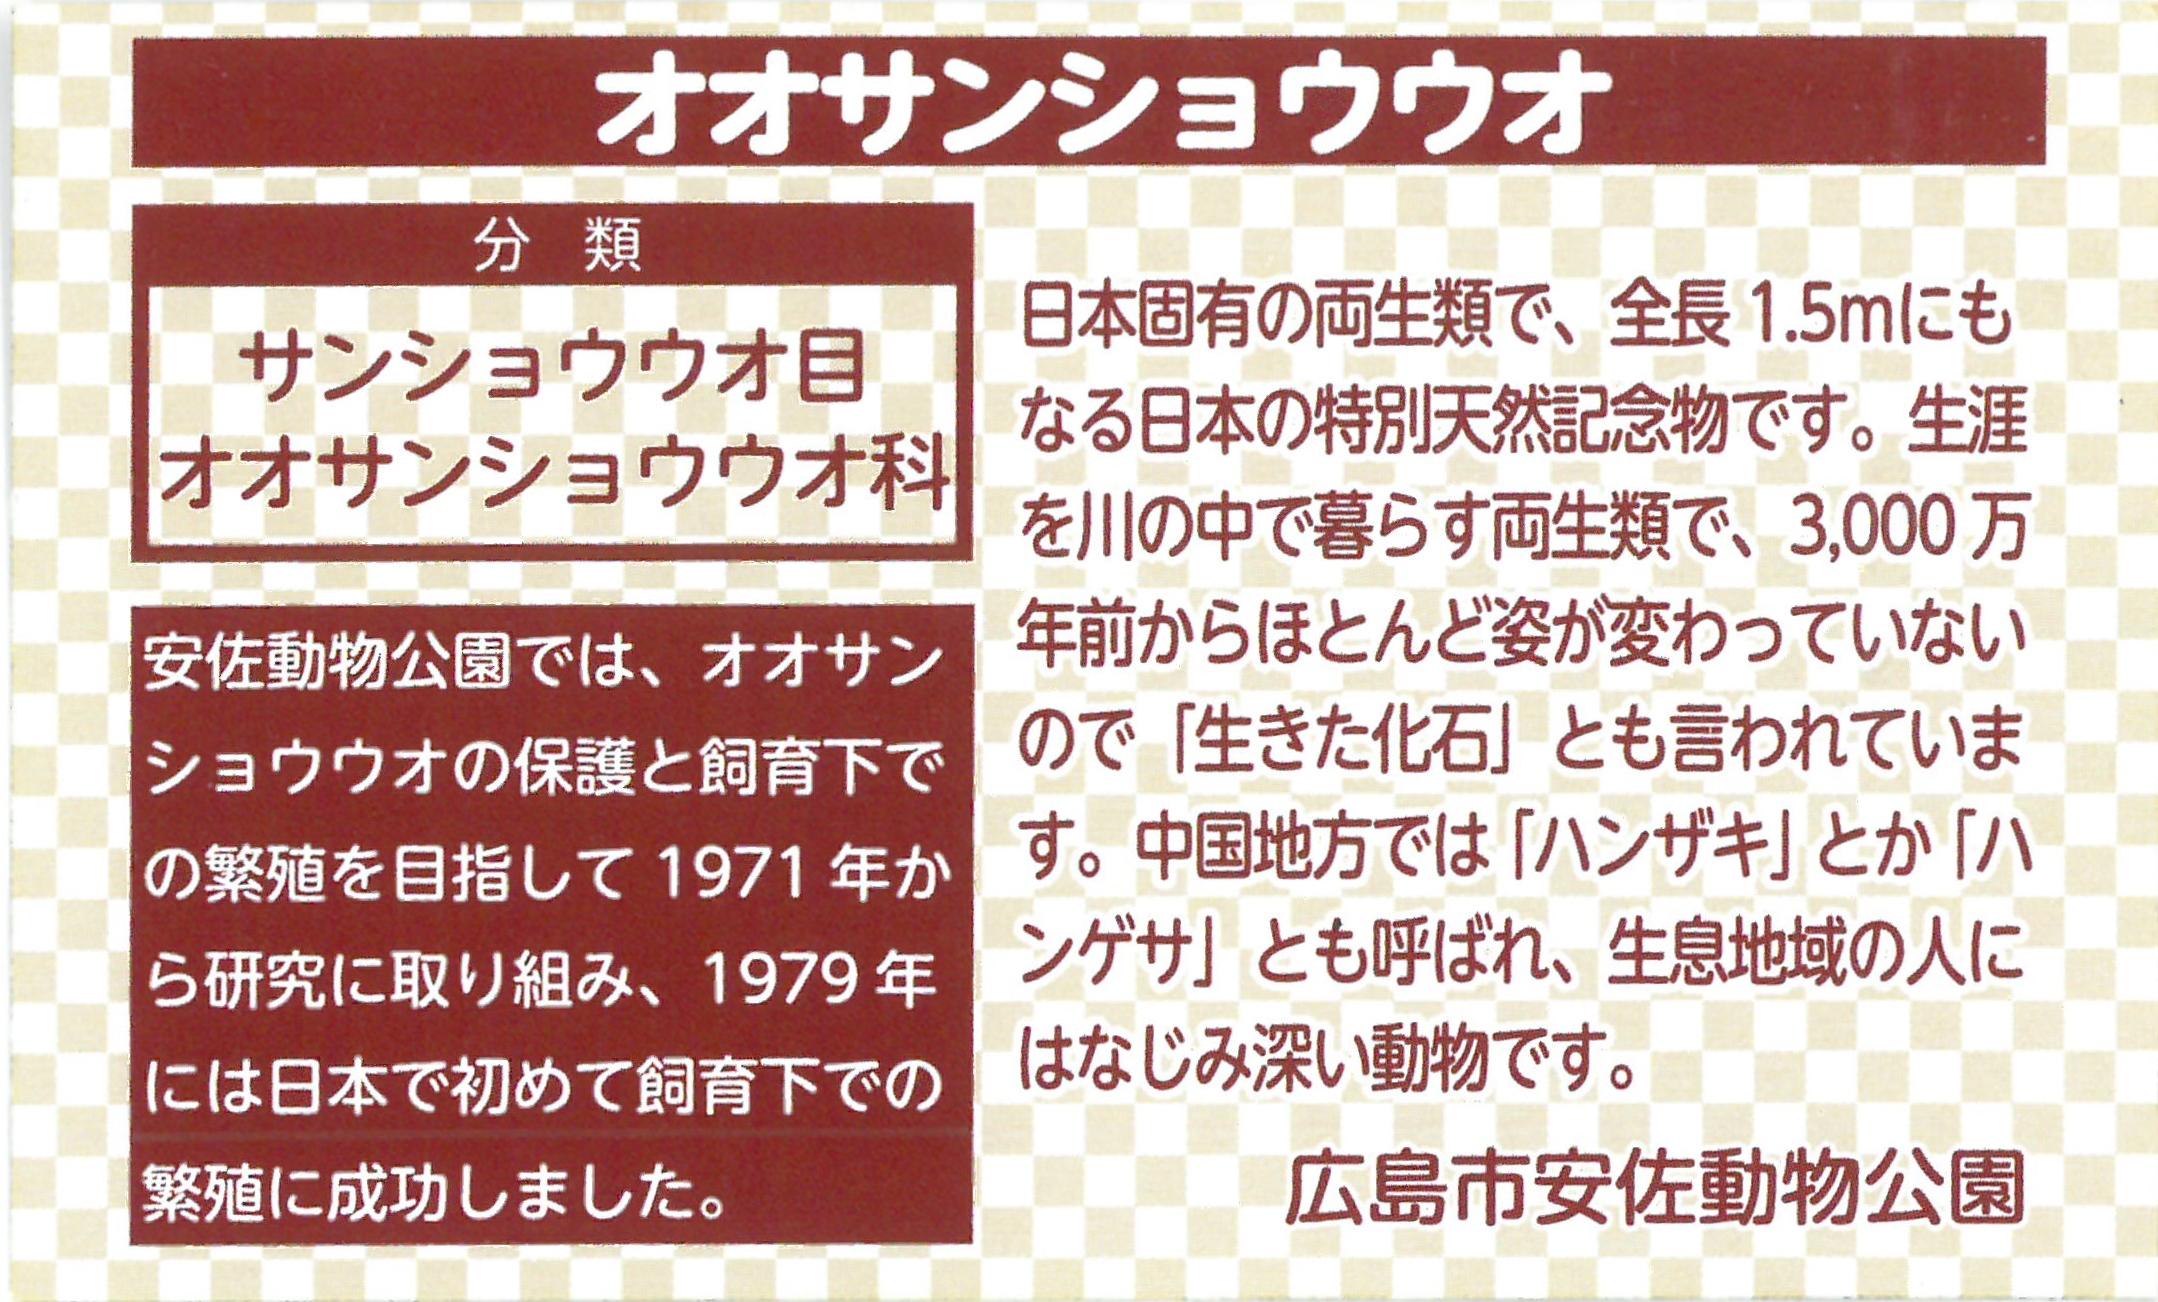 http://www.asazoo.jp/animal/blog/20170614_%E3%82%B5%E3%83%B3%E3%81%A1%E3%82%83%E3%82%93%E3%82%AF%E3%83%83%E3%82%AD%E3%83%BC03.jpg